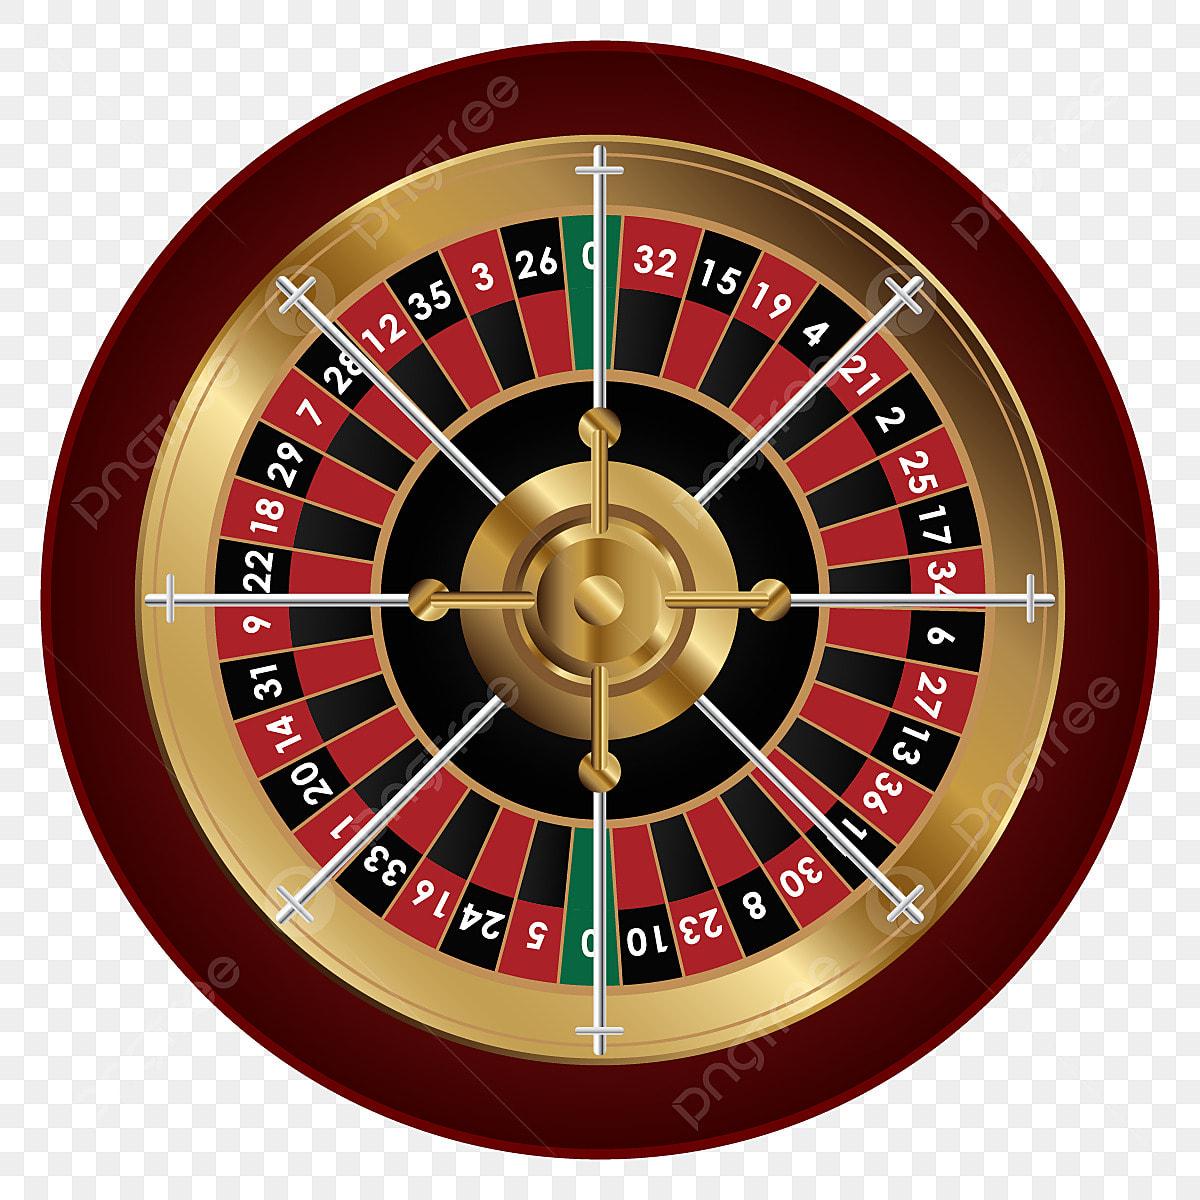 Картинки рулетки казино online casino games in the usa